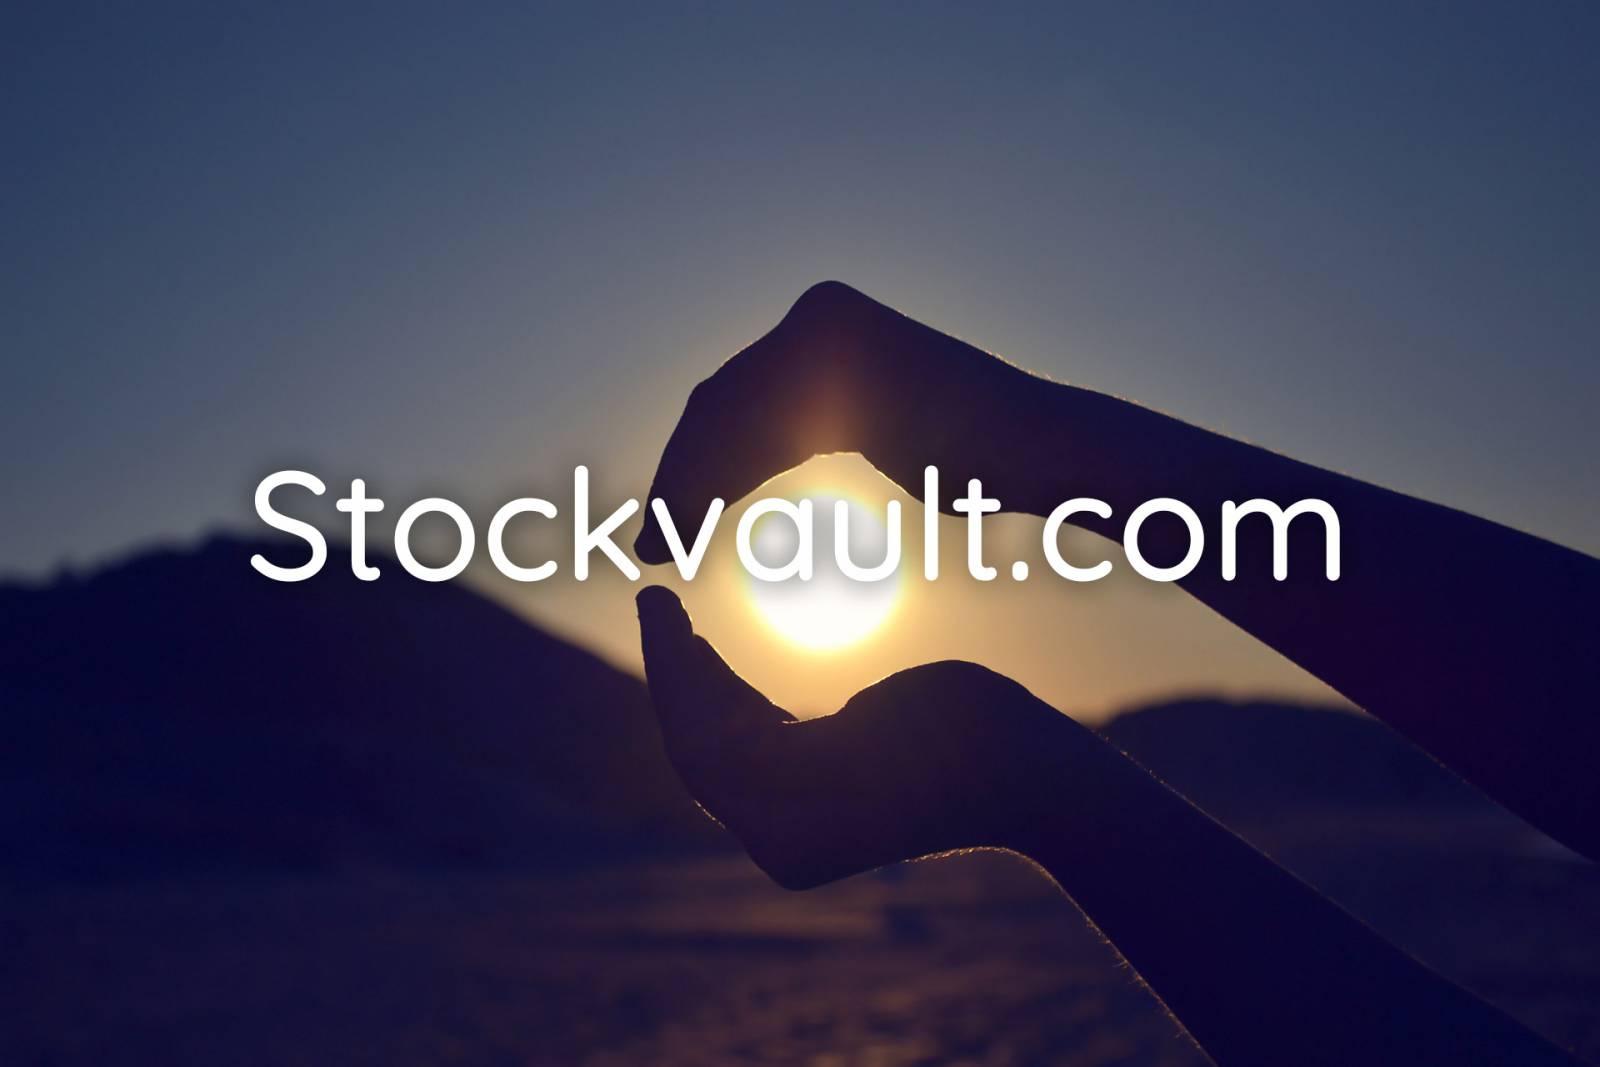 stockvault gratis stockfoto's